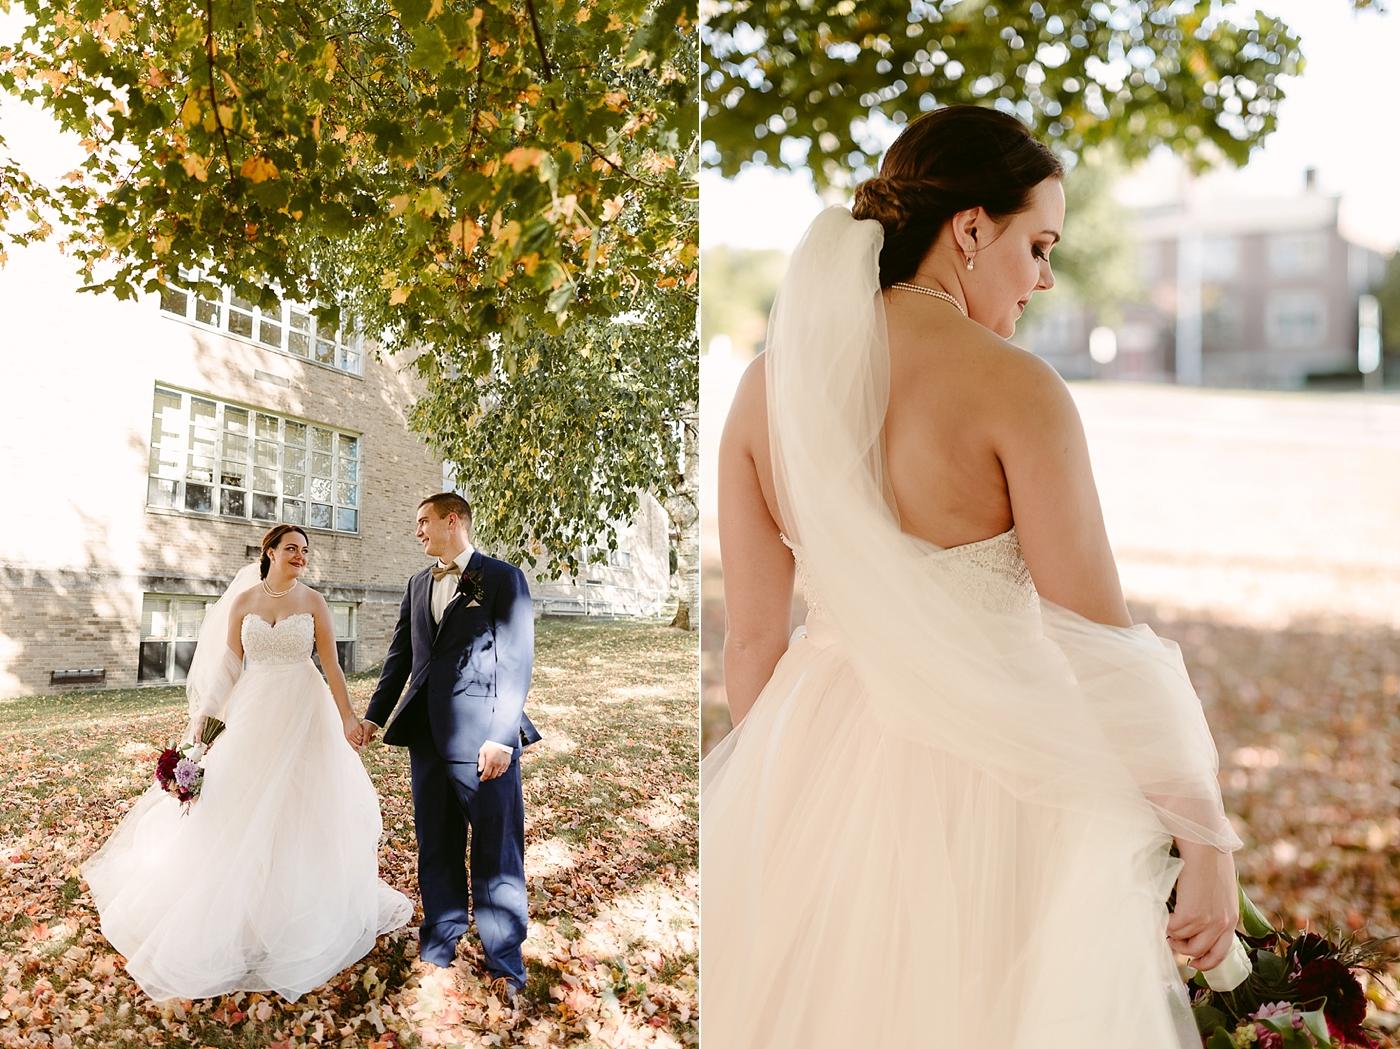 TheHeartlanders-Massilon-Ohio-Wedding-Photography-6.jpg